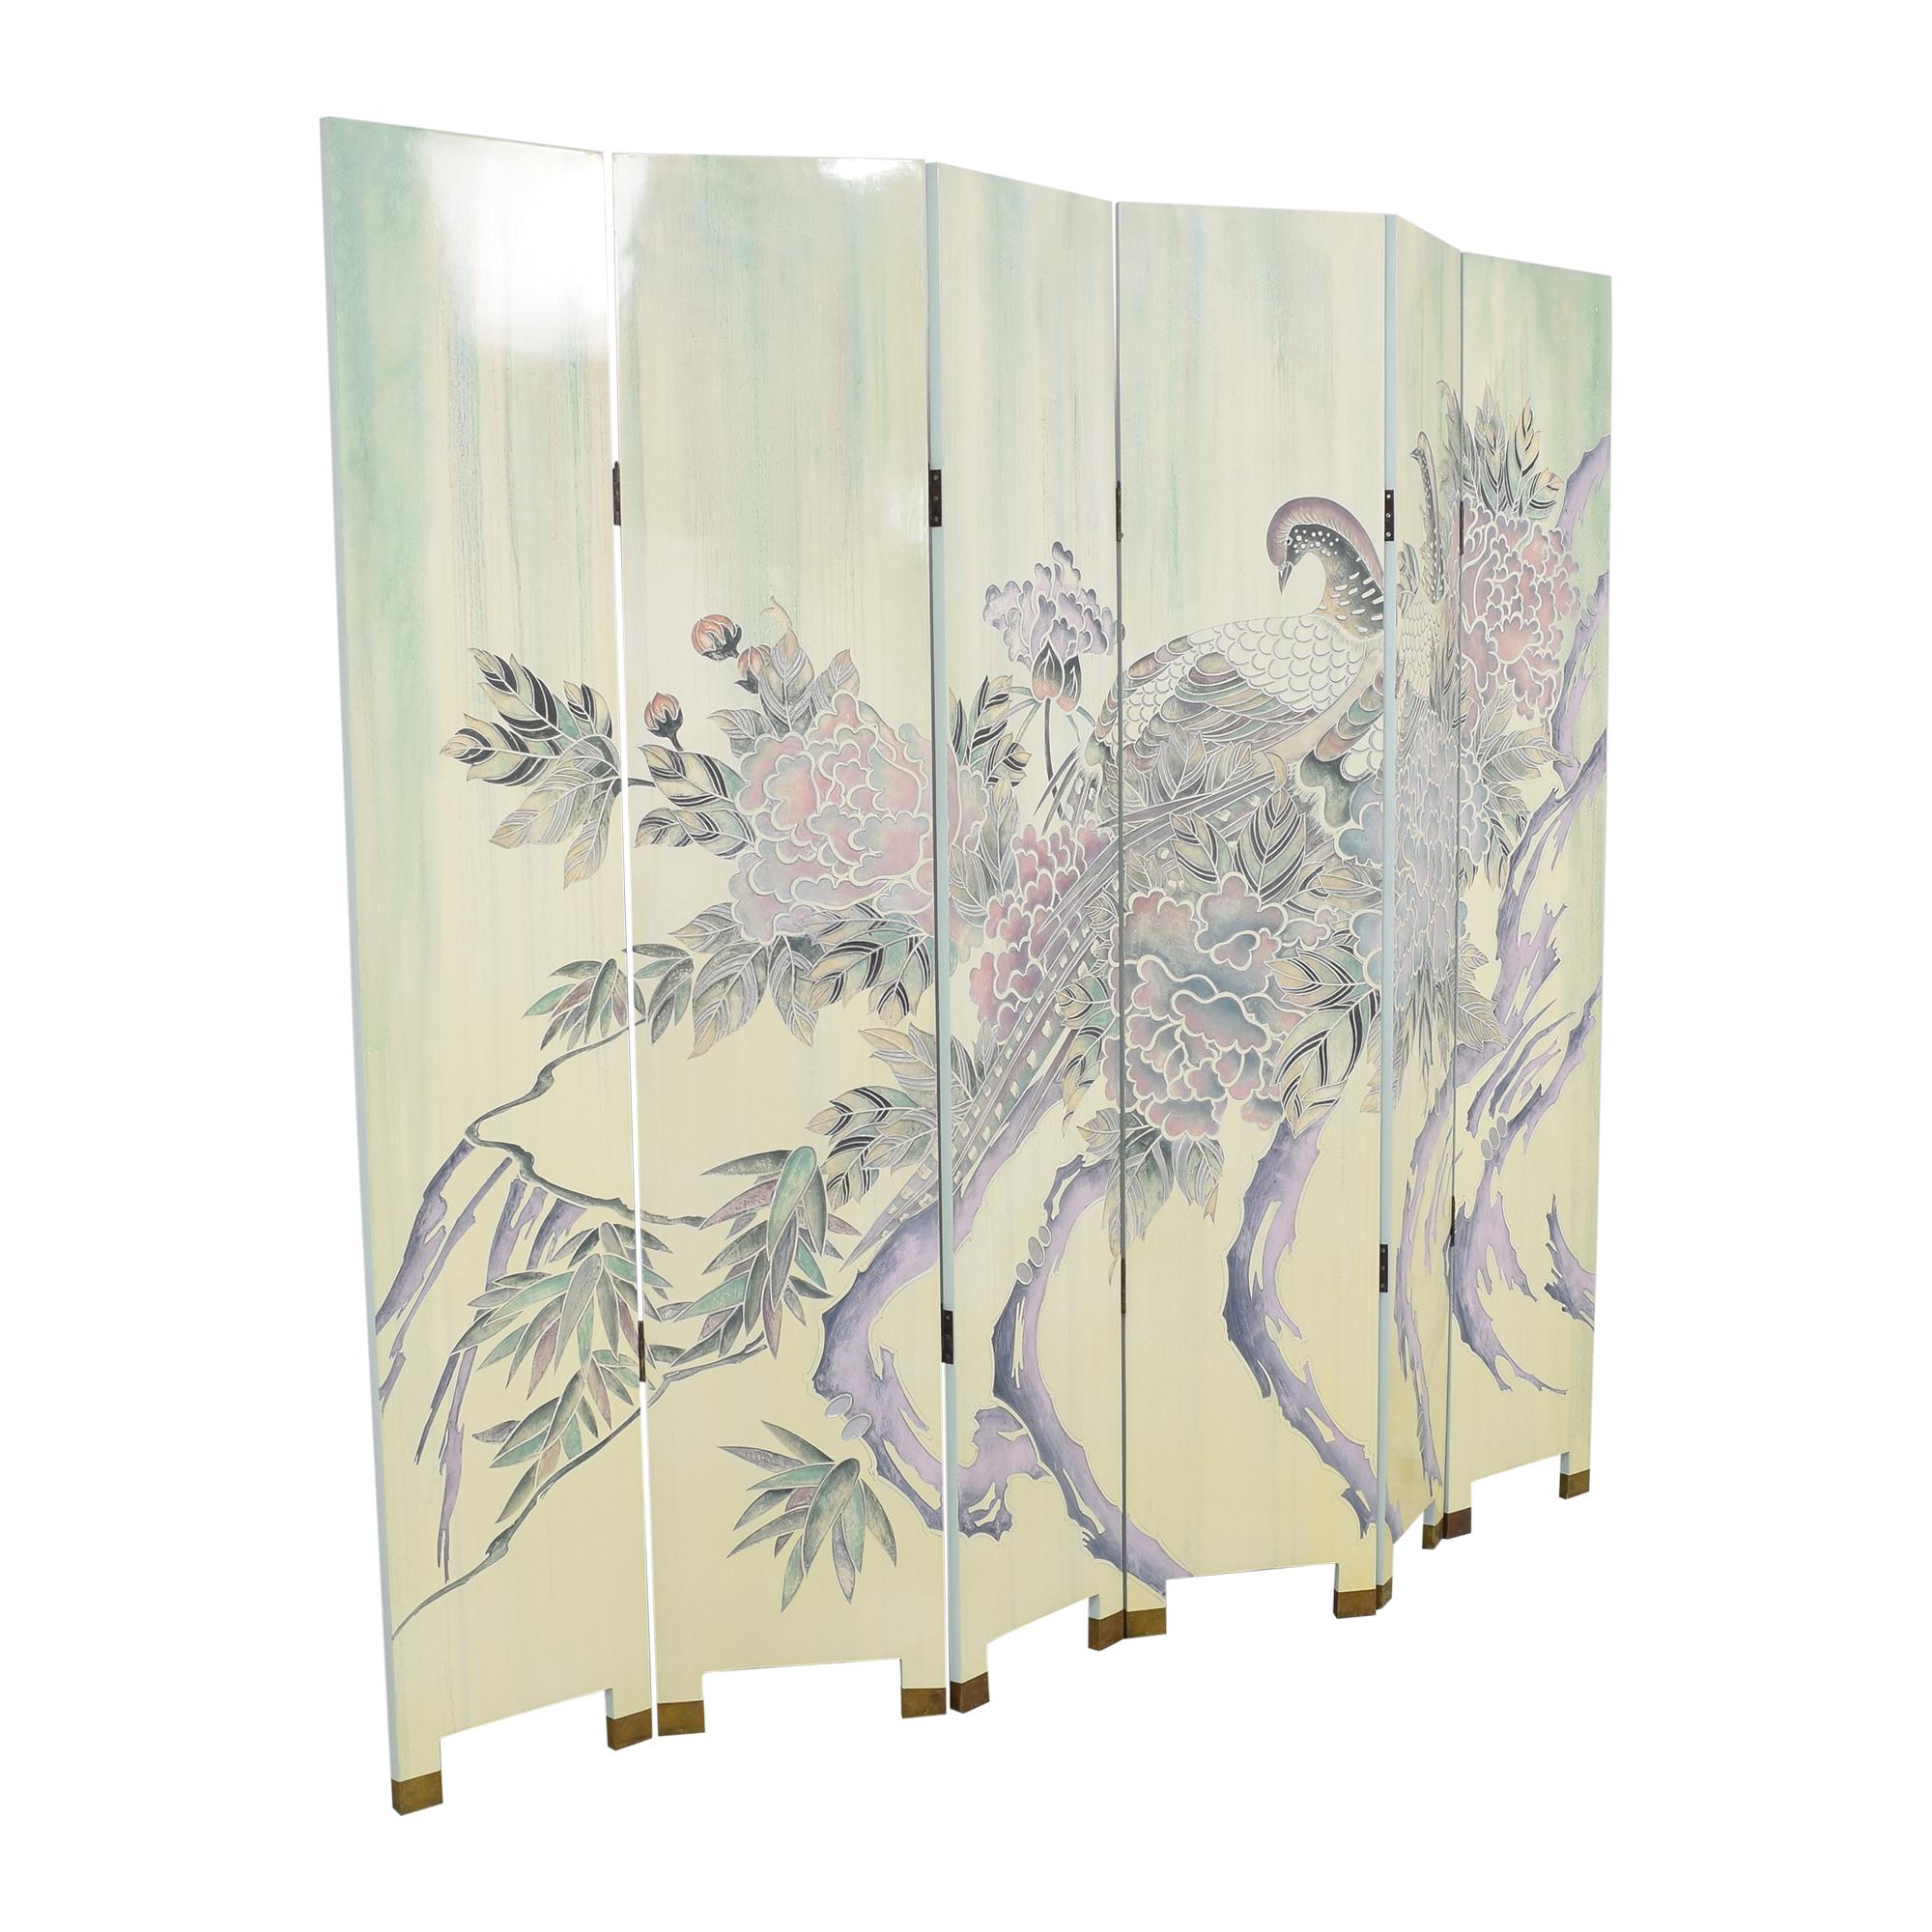 Decorative Six Panel Room Screen / Dividers